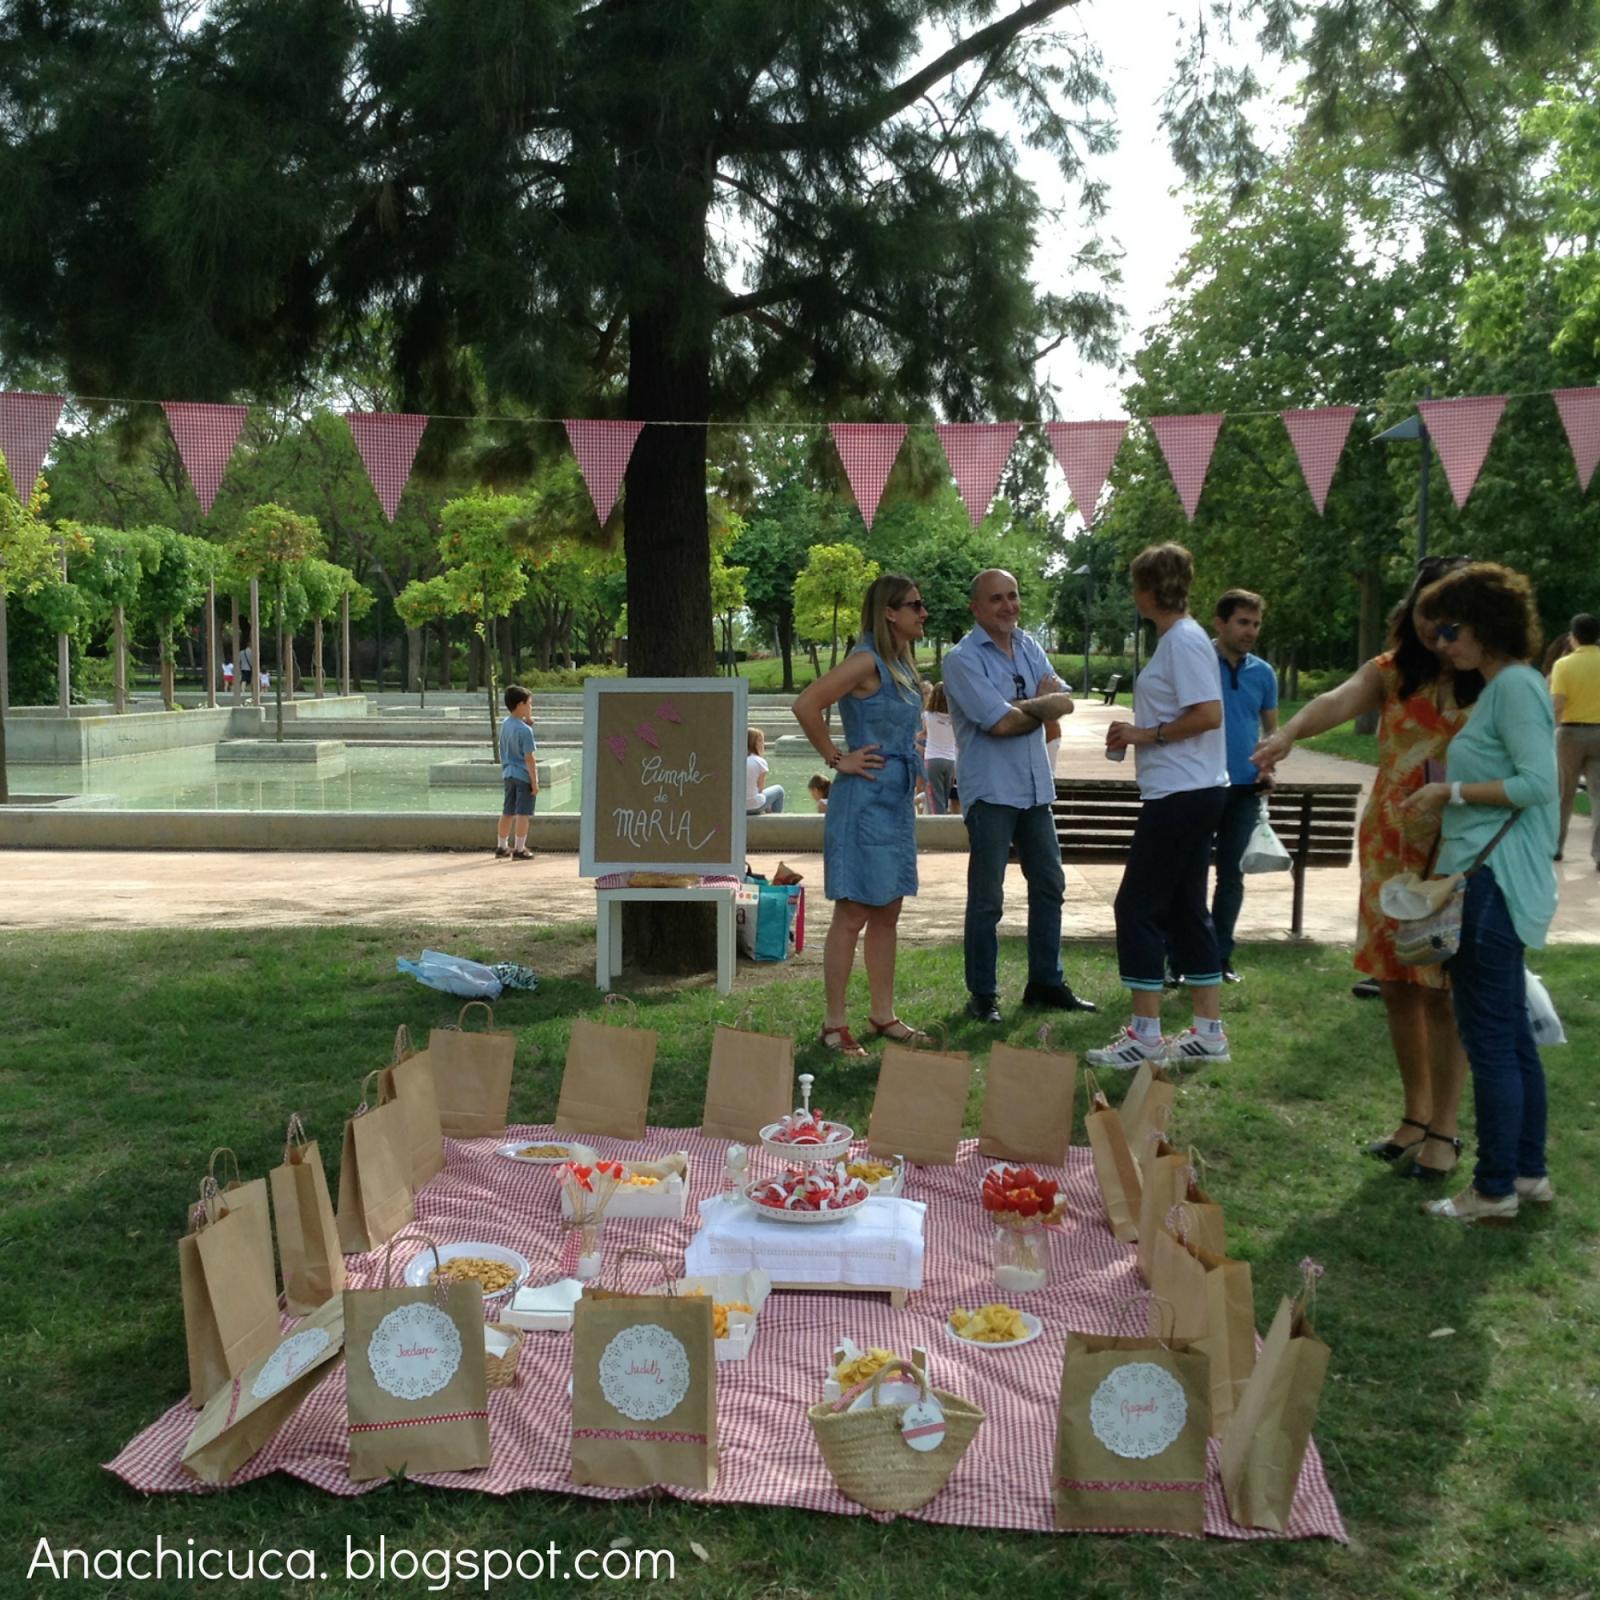 Anachicuca el picnic cumplea os de maria - Cumpleanos al aire libre ...